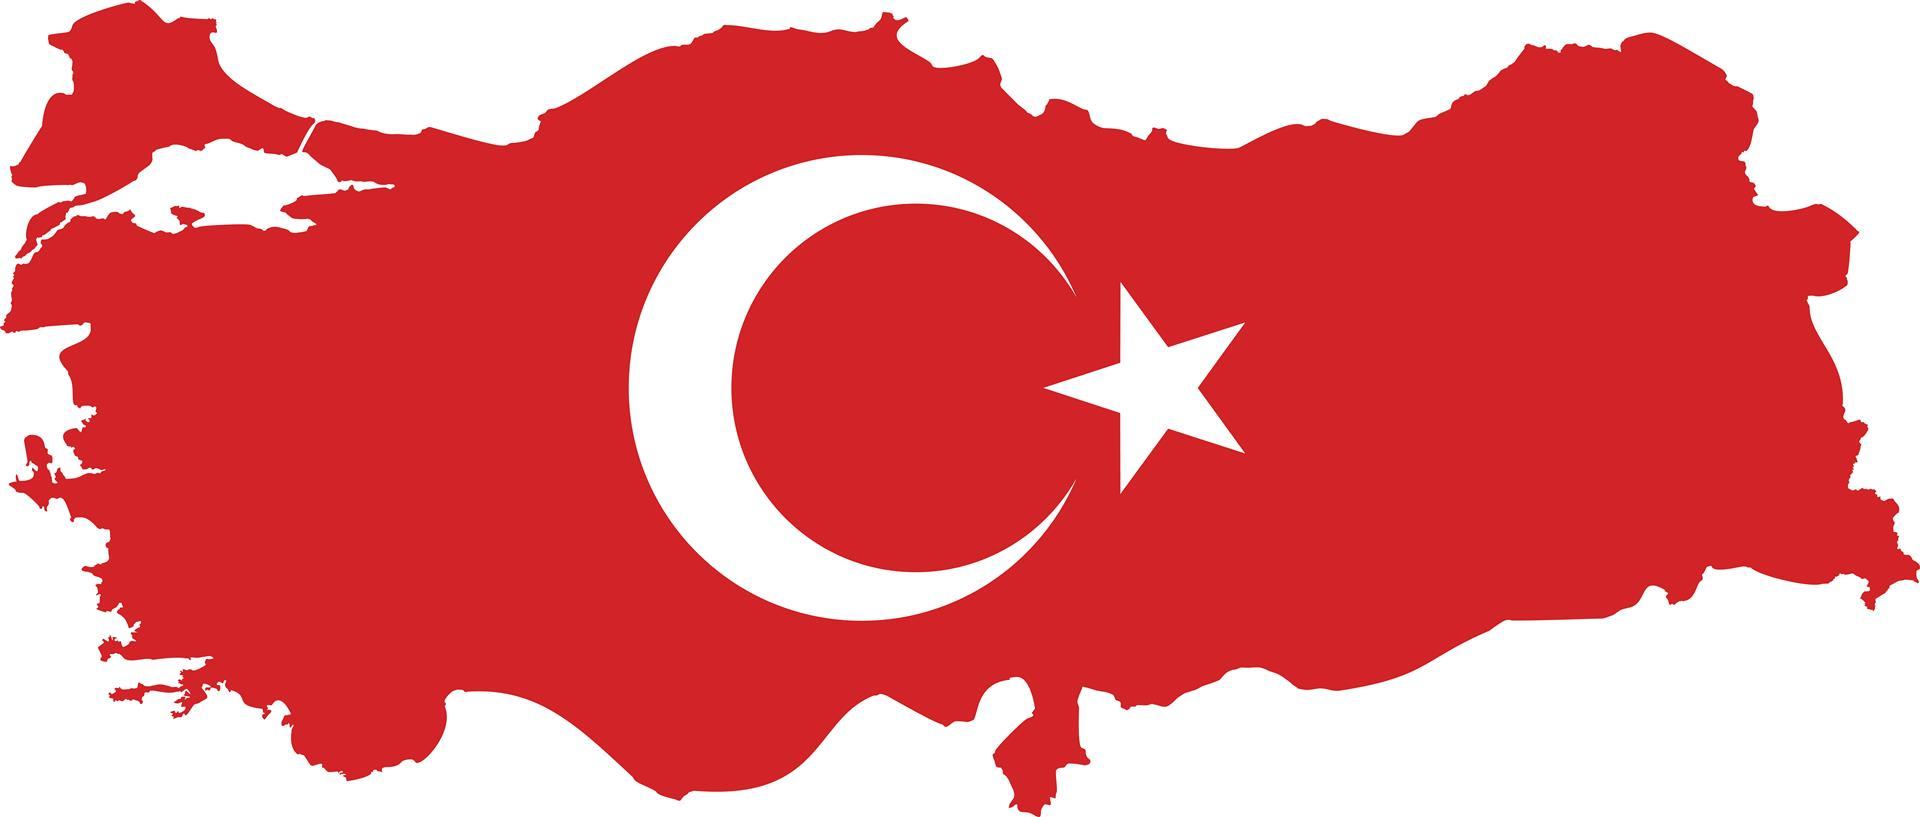 Turkey map with flag. flag map turkey country on digital ...